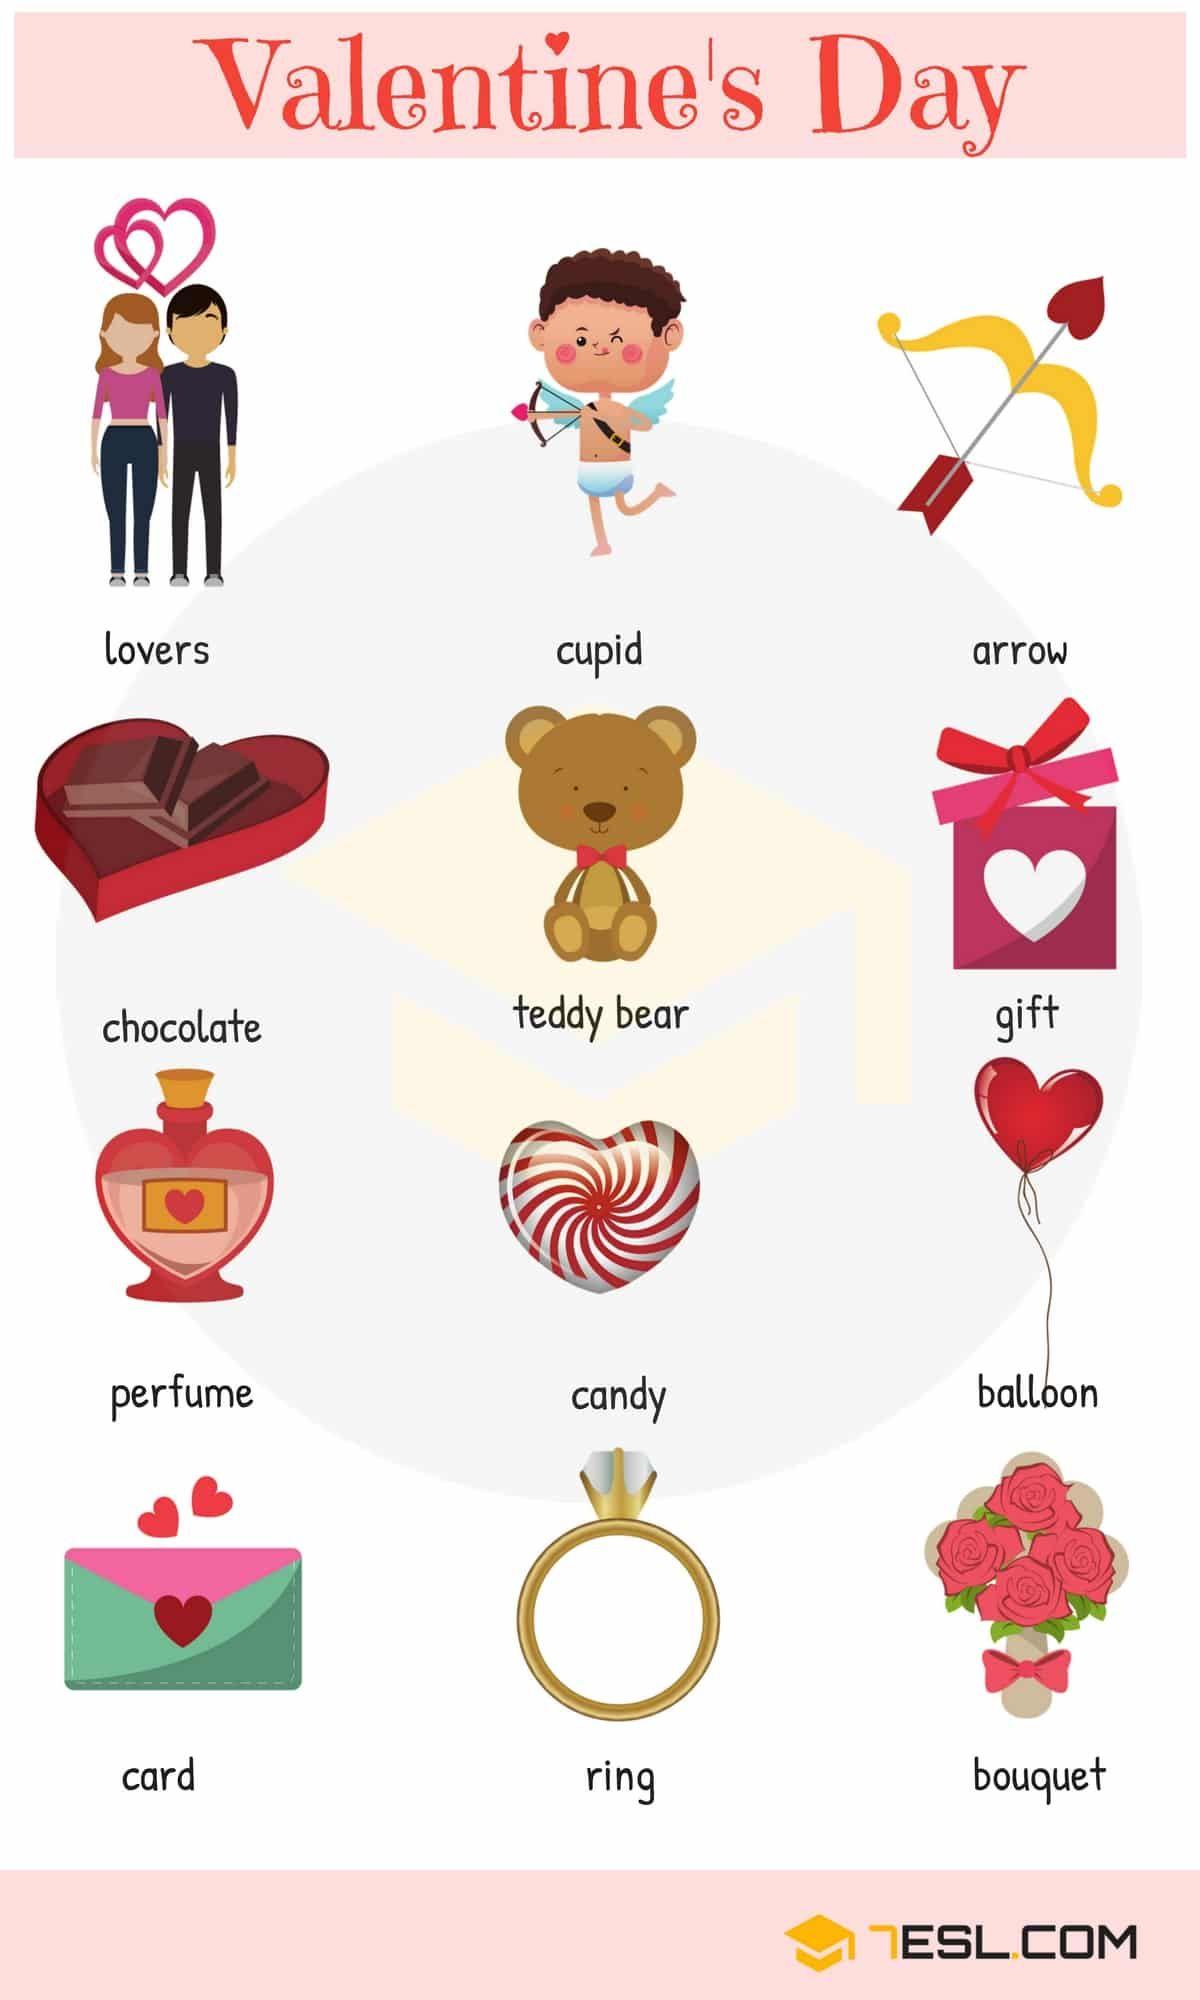 Valentine Words Useful Valentine's Day Vocabulary Words